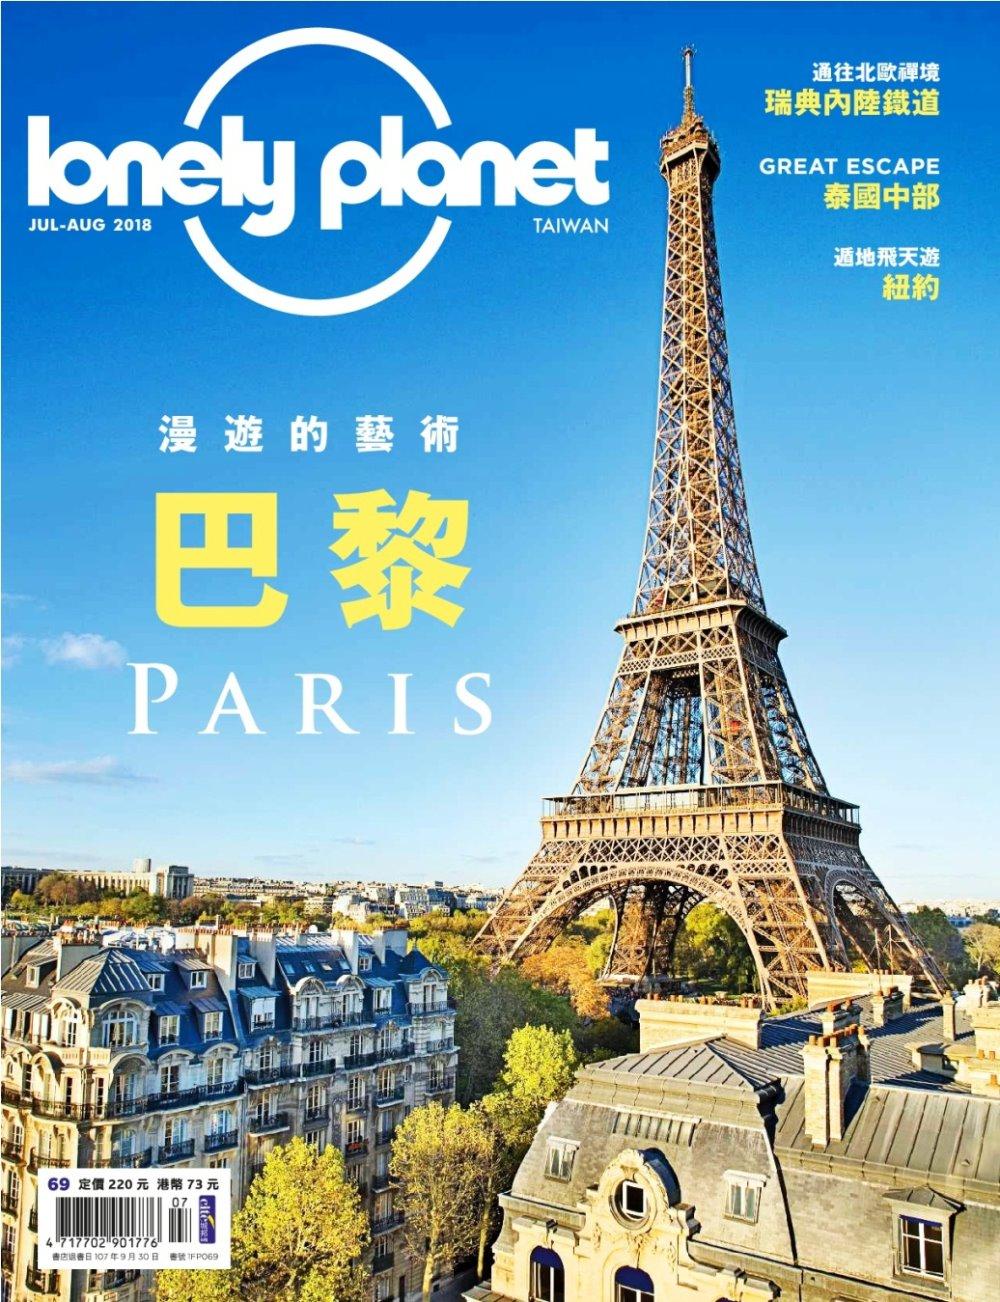 孤獨星球Lonely Planet 7月號/2018第69期